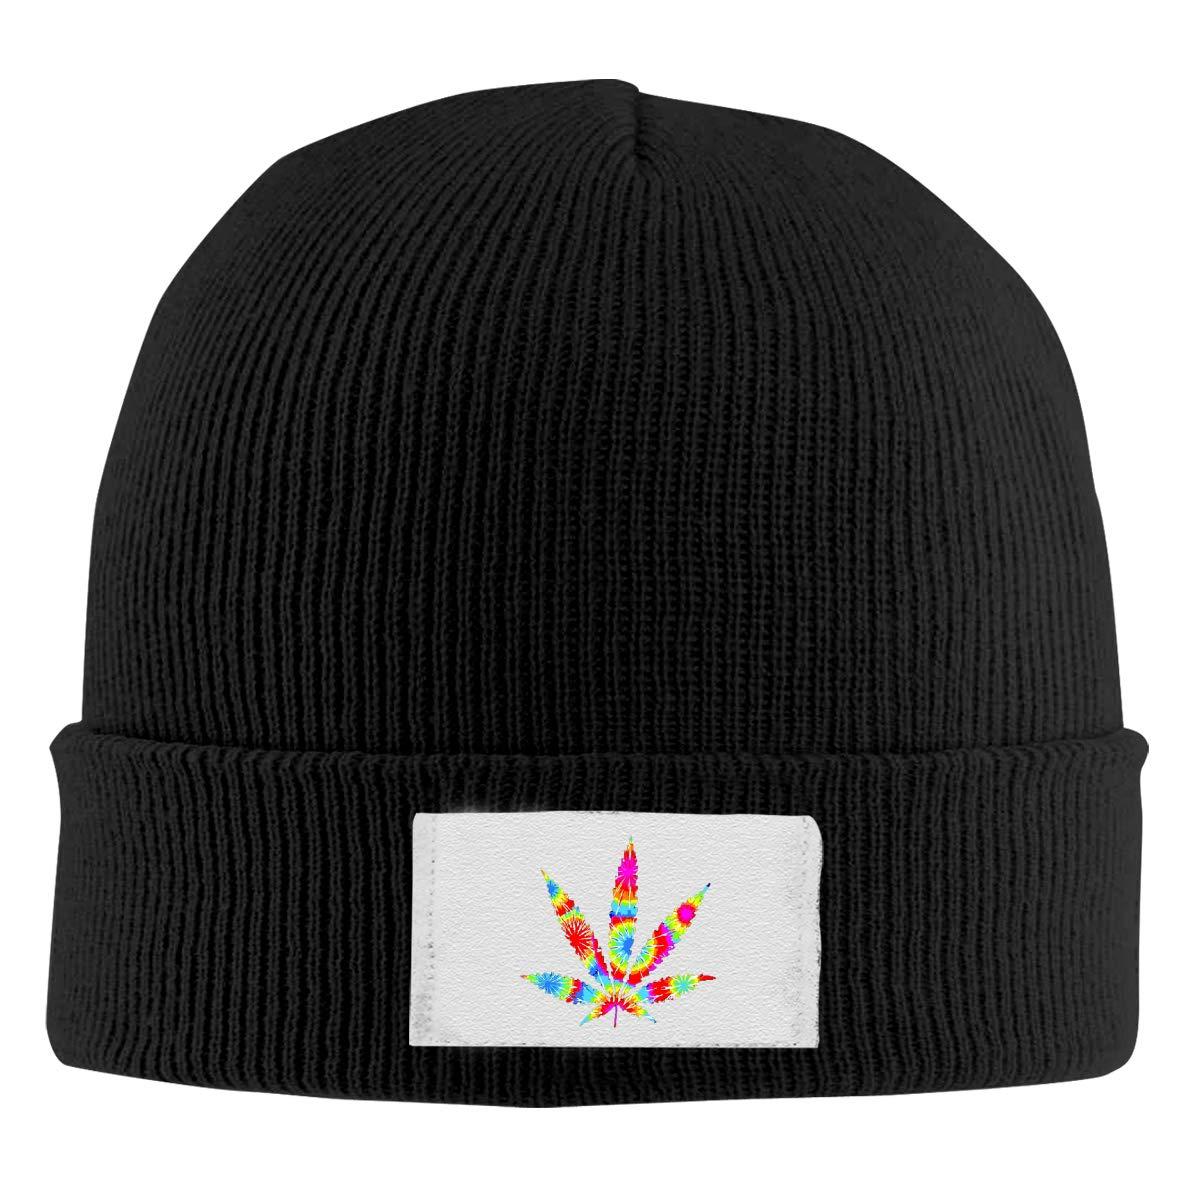 Unisex Stylish Slouch Beanie Hats Black Tie Dye Weed Marijuana Top Level Beanie Men Women